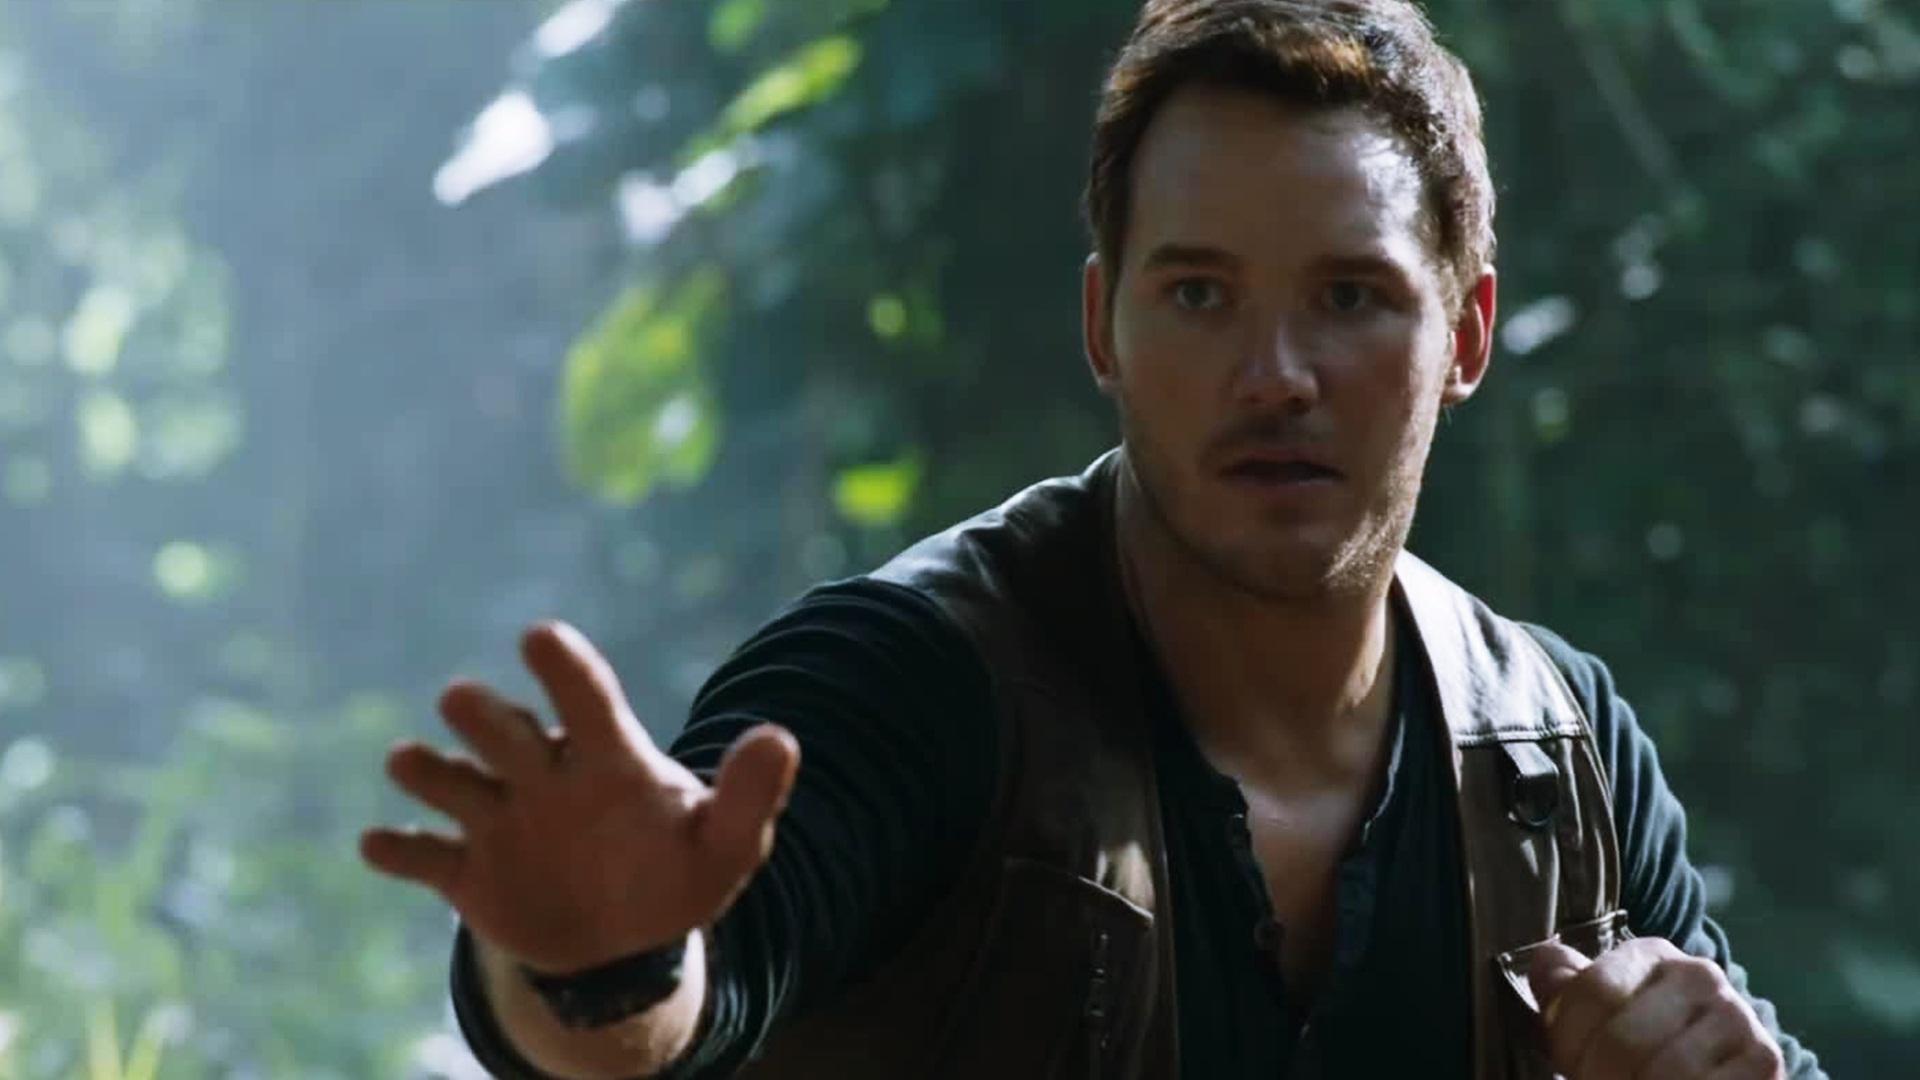 Chris Pratt Jurassic World Fallen Kingdom Hd Desktop